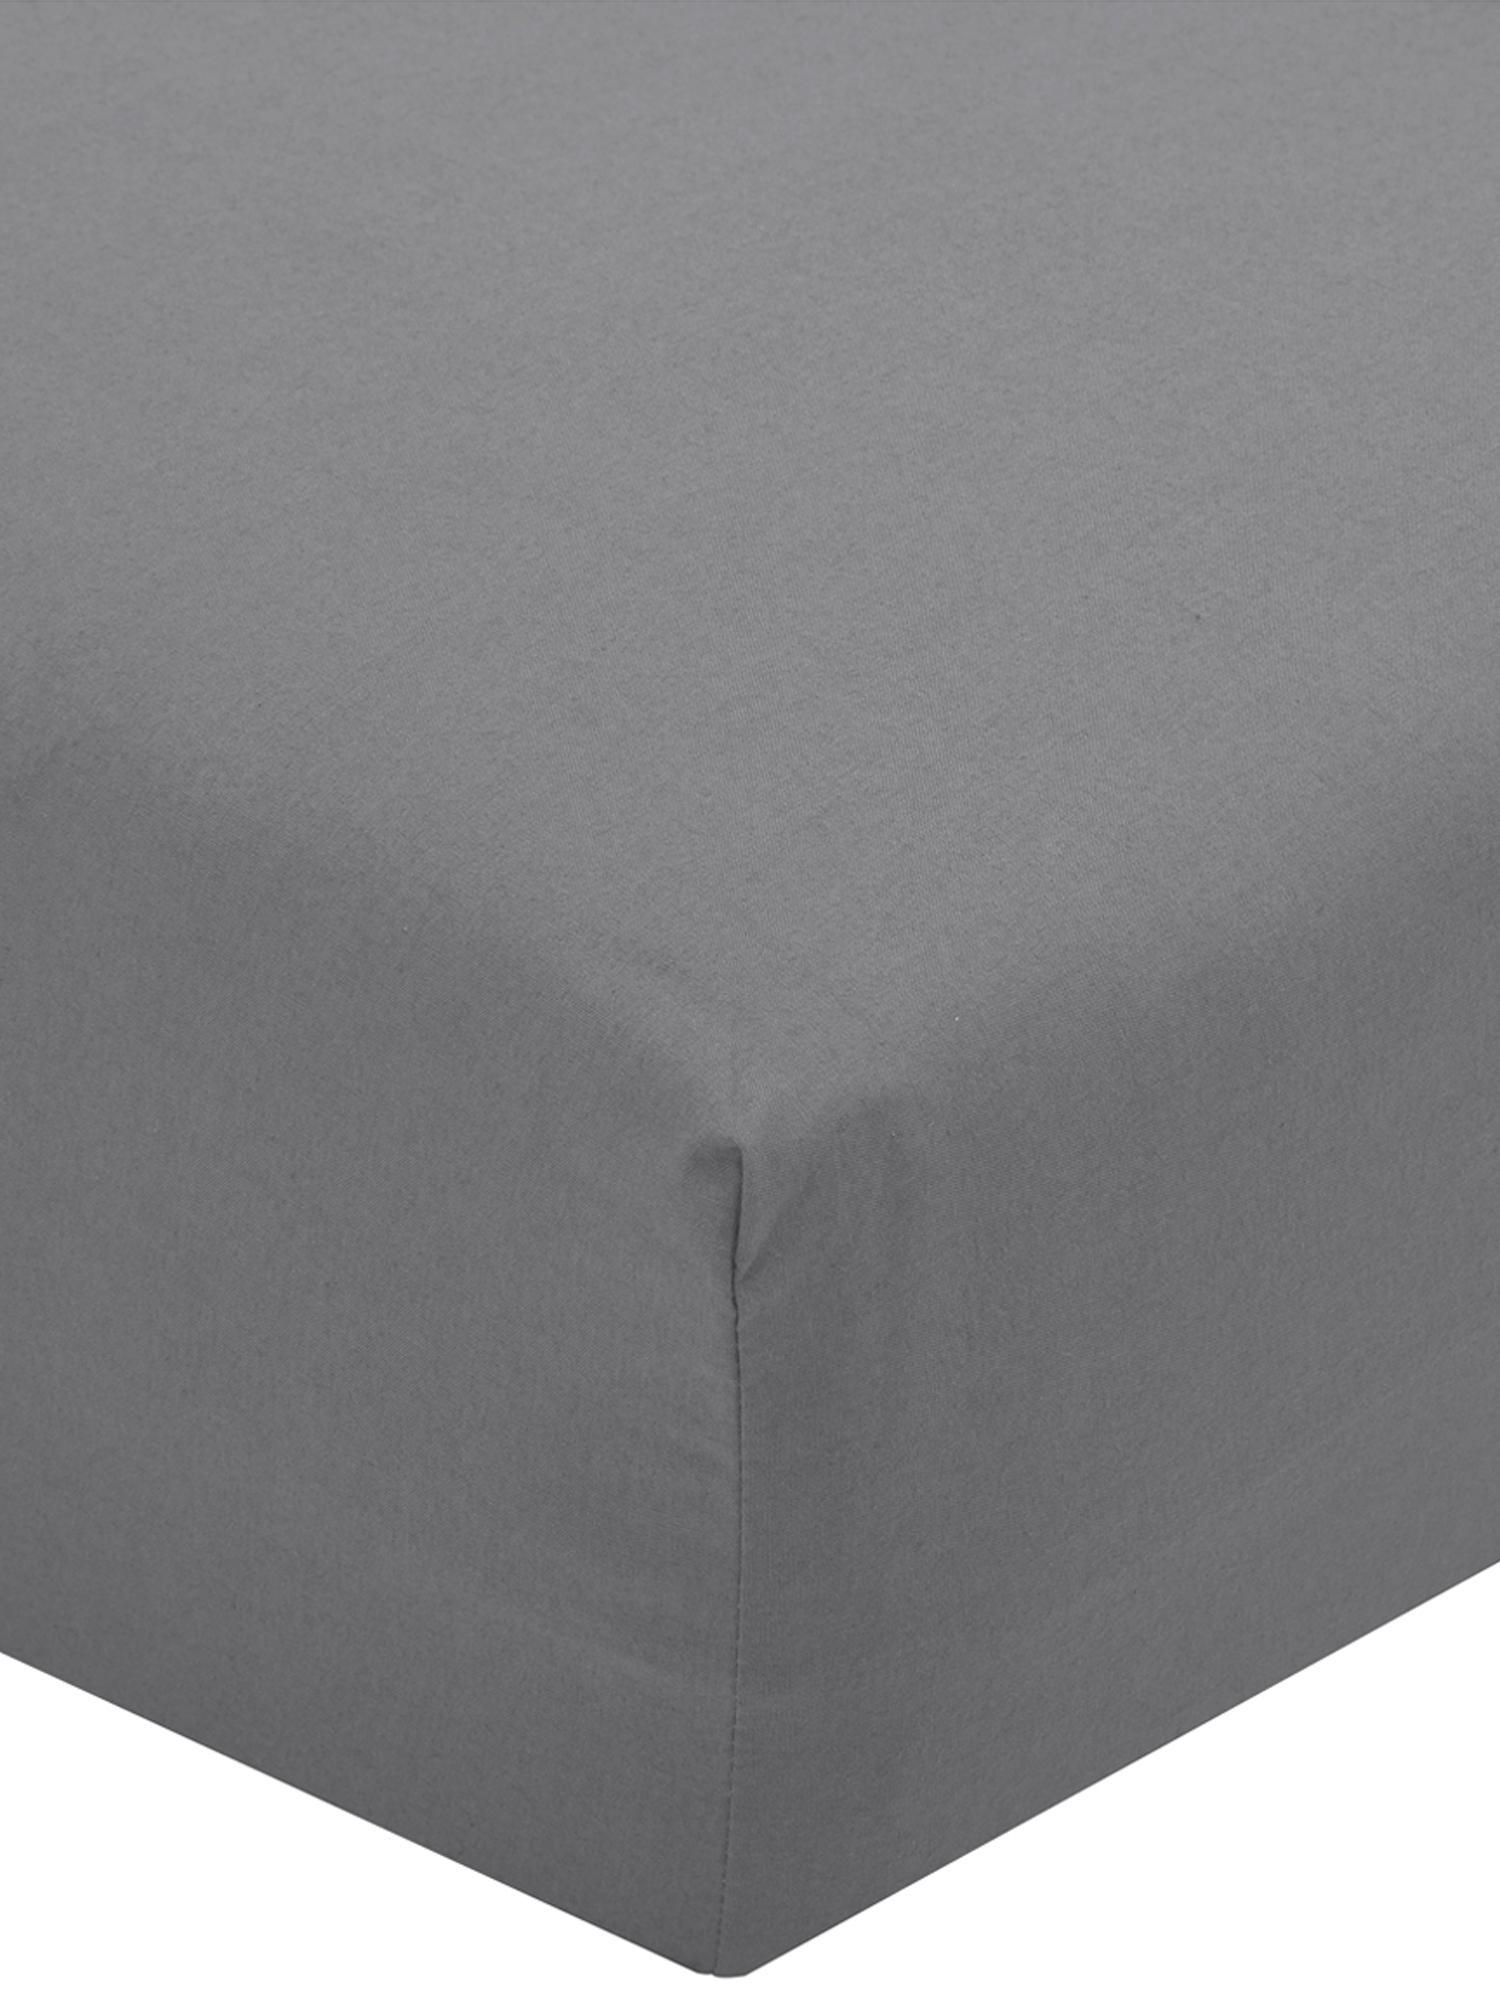 Sábana bajera de percal Elsie, Gris oscuro, Cama 135/140 cm (140 x 200 cm)